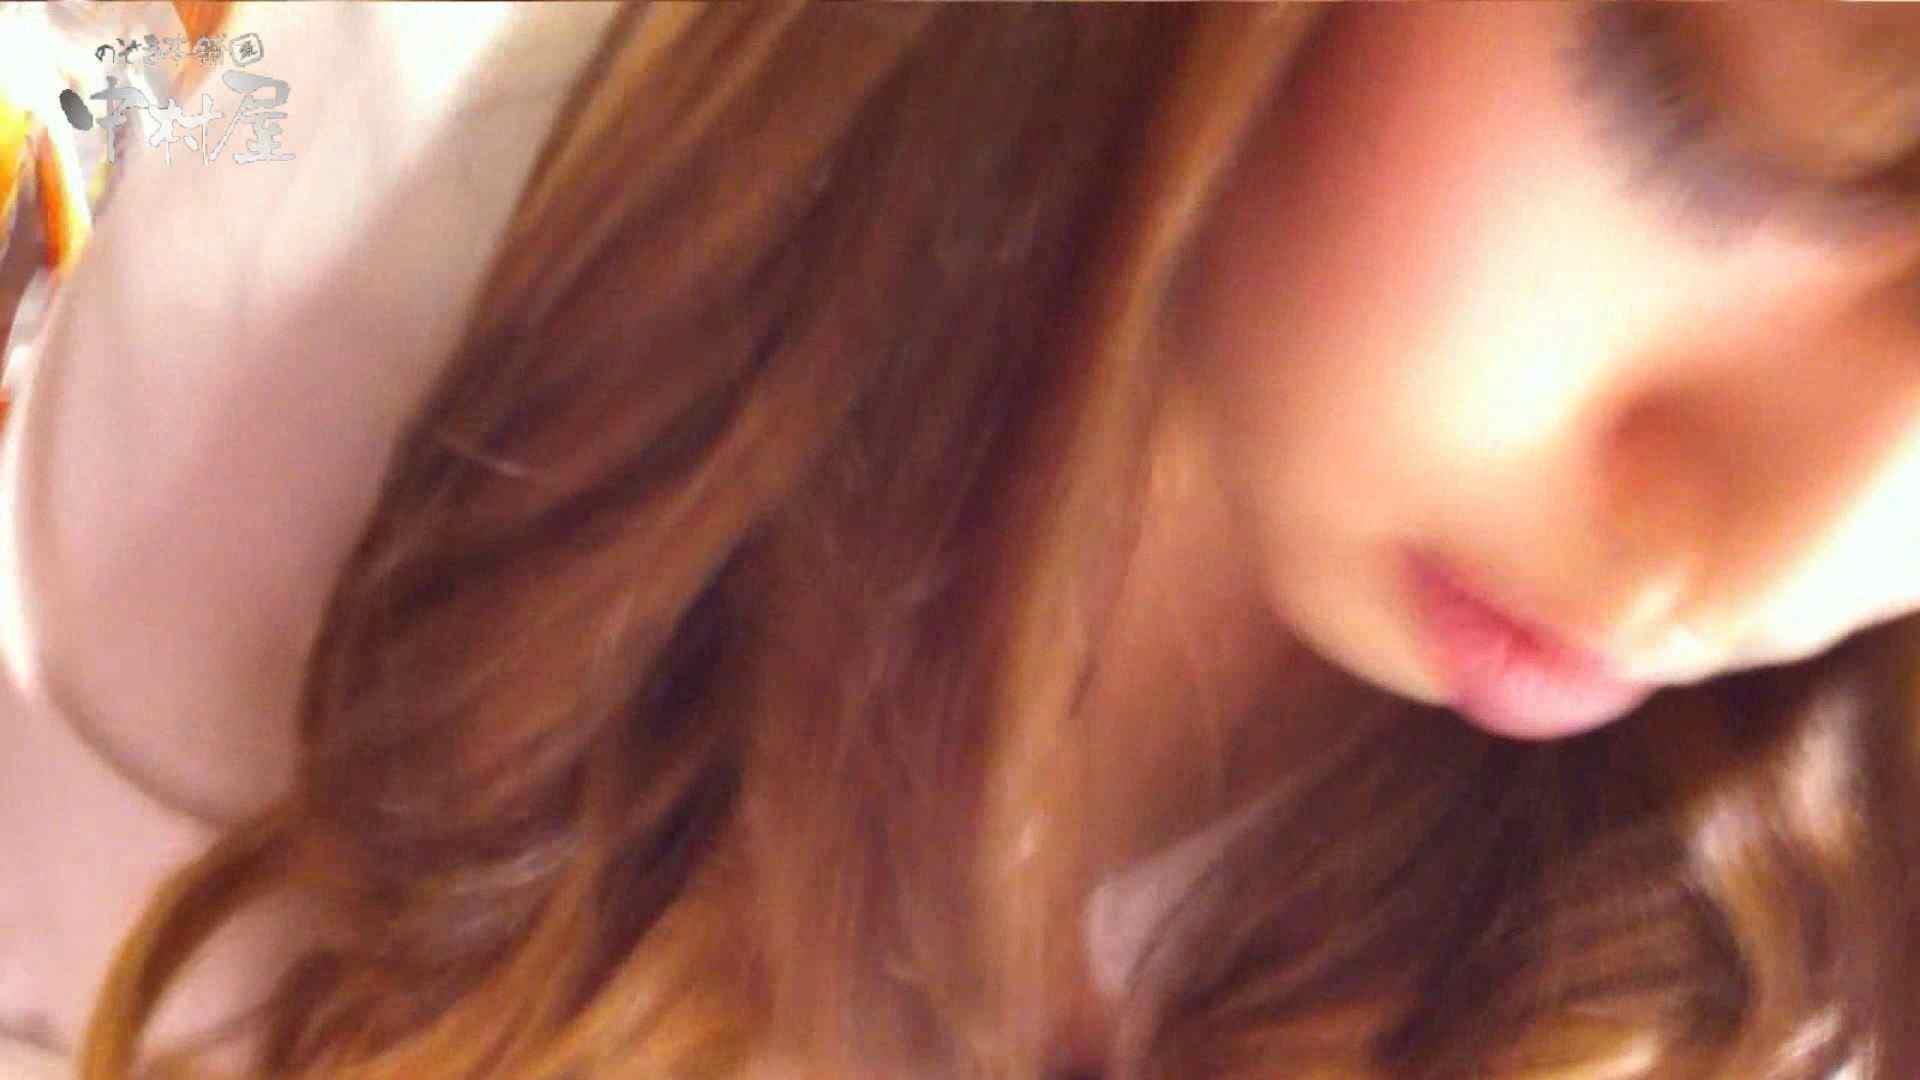 vol.85 美人アパレル胸チラ&パンチラ そそる唇の店員さん パンチラ おまんこ無修正動画無料 113PICs 14